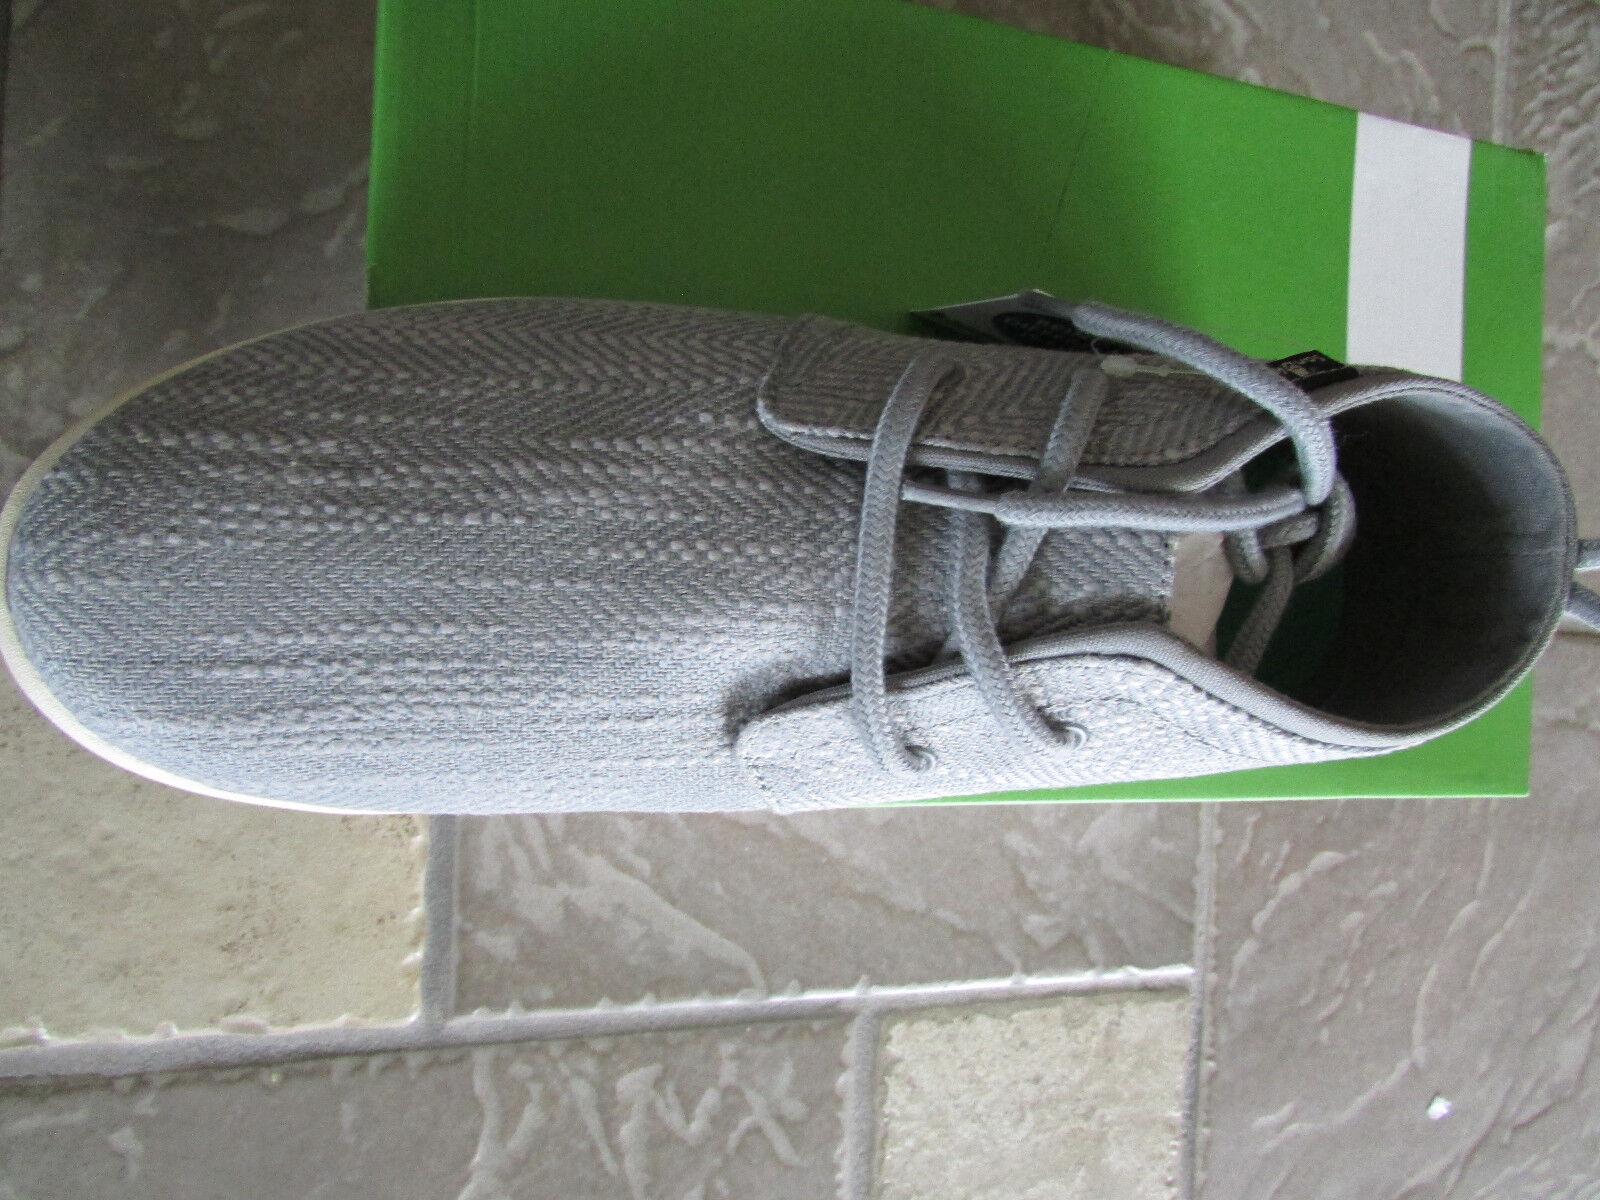 NEW SANUK CARGO TX GRAY CHUKKA Schuhe Schuhe Schuhe  Herren 10.5 CANVAS FREE SHIP 31ca15